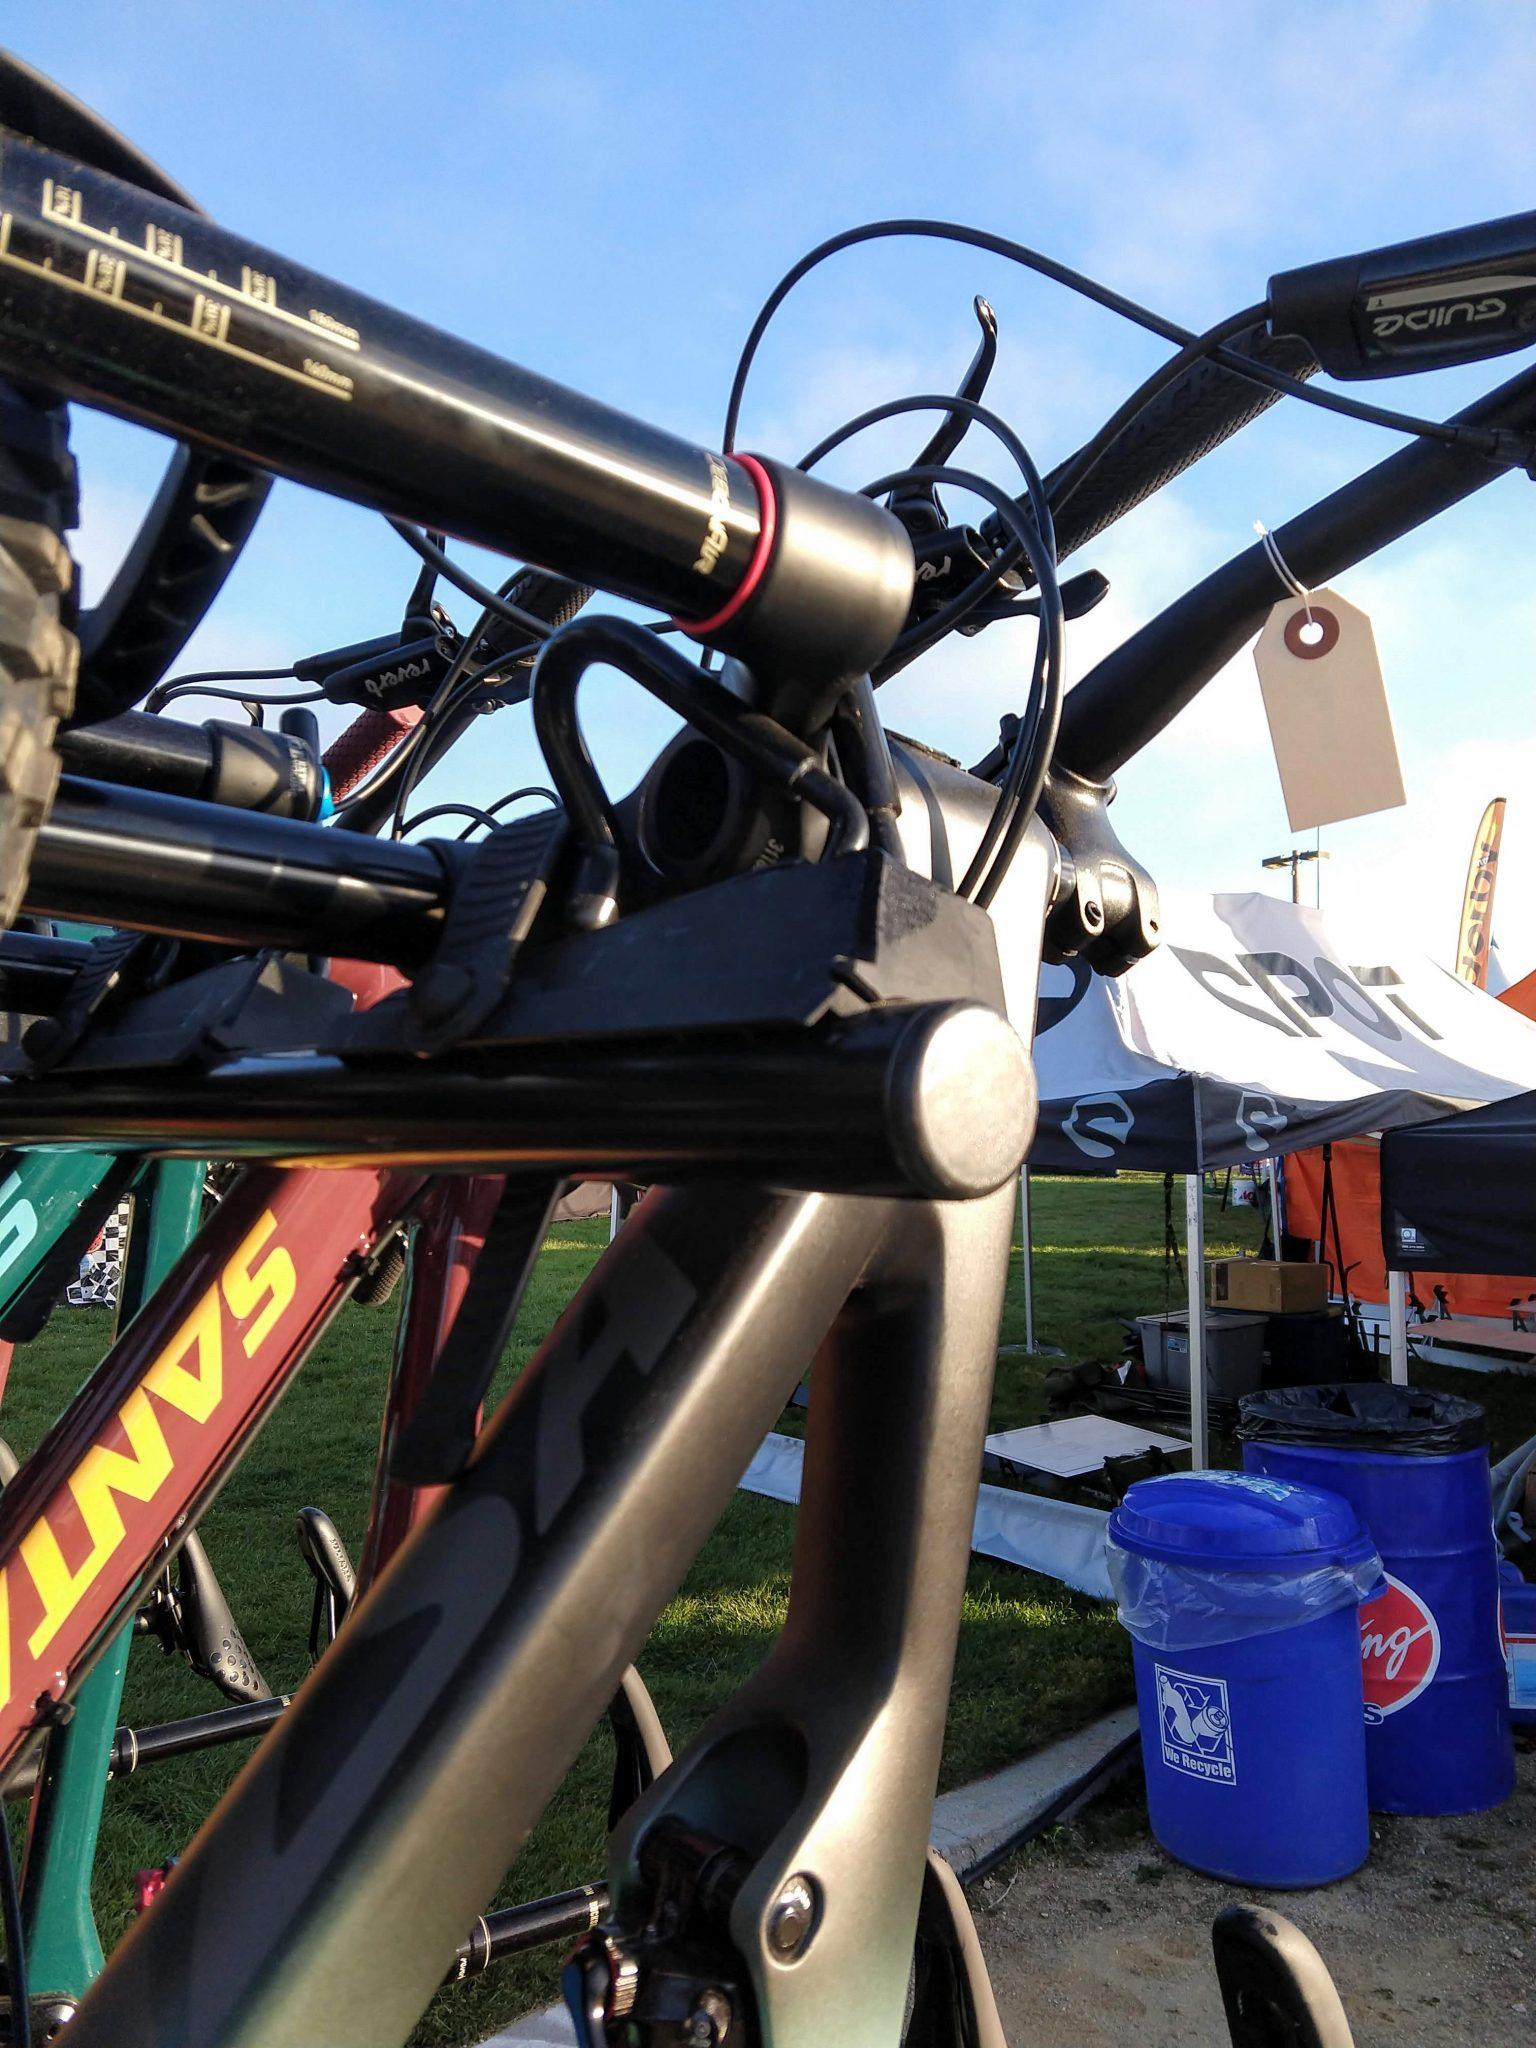 alta racks, Yakima, hangover, Hang over, upright , revolution, gpr, lolo, recon, north shore, rack, bike rack, six bike rack, five bike rack, four bike rack, three bike rack, camping, van life, sprinterlife, sprinter, econoline, promaster, dodge, van, alta six, best rack ever,best bike rack